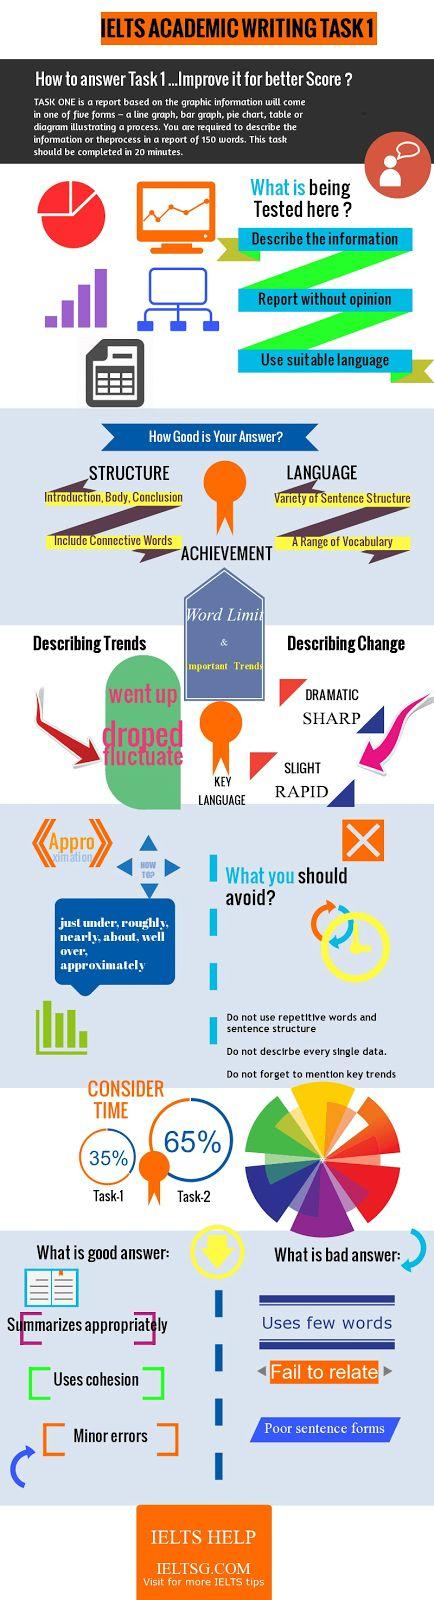 IELTS Writing Task-1 infographics.